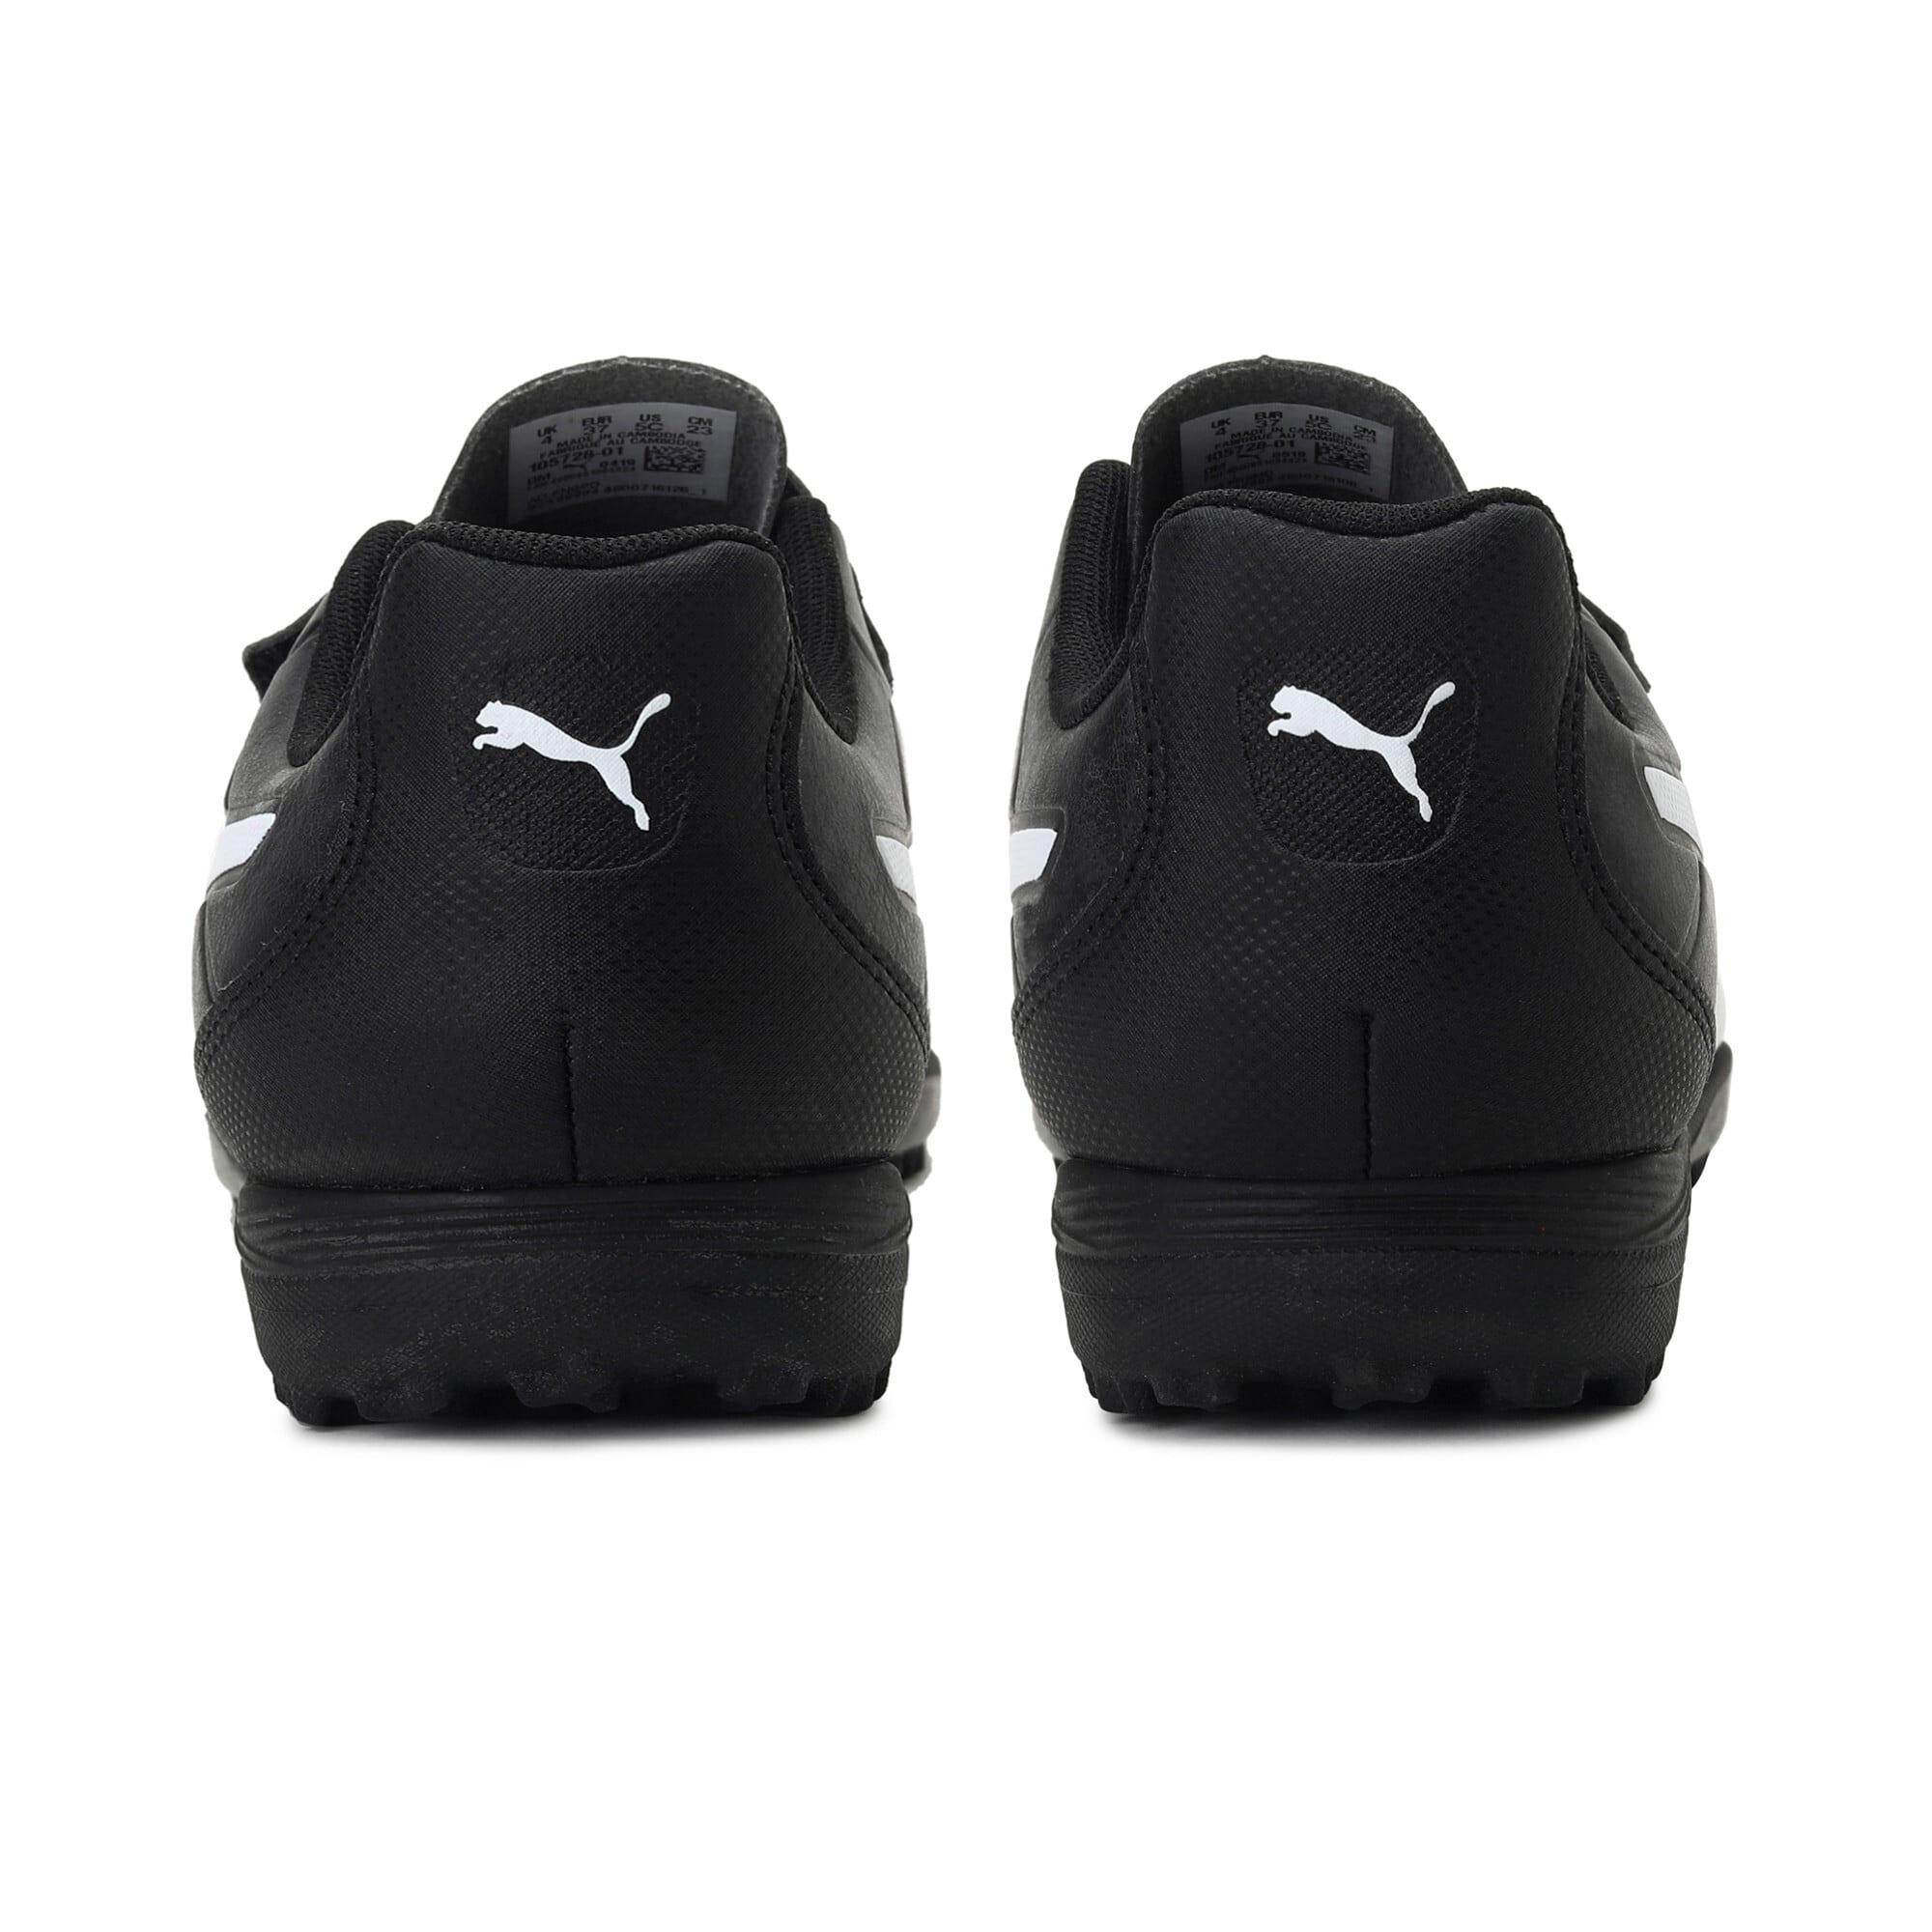 Thumbnail 3 of Monarch TT Youth Football Boots, Puma Black-Puma White, medium-IND